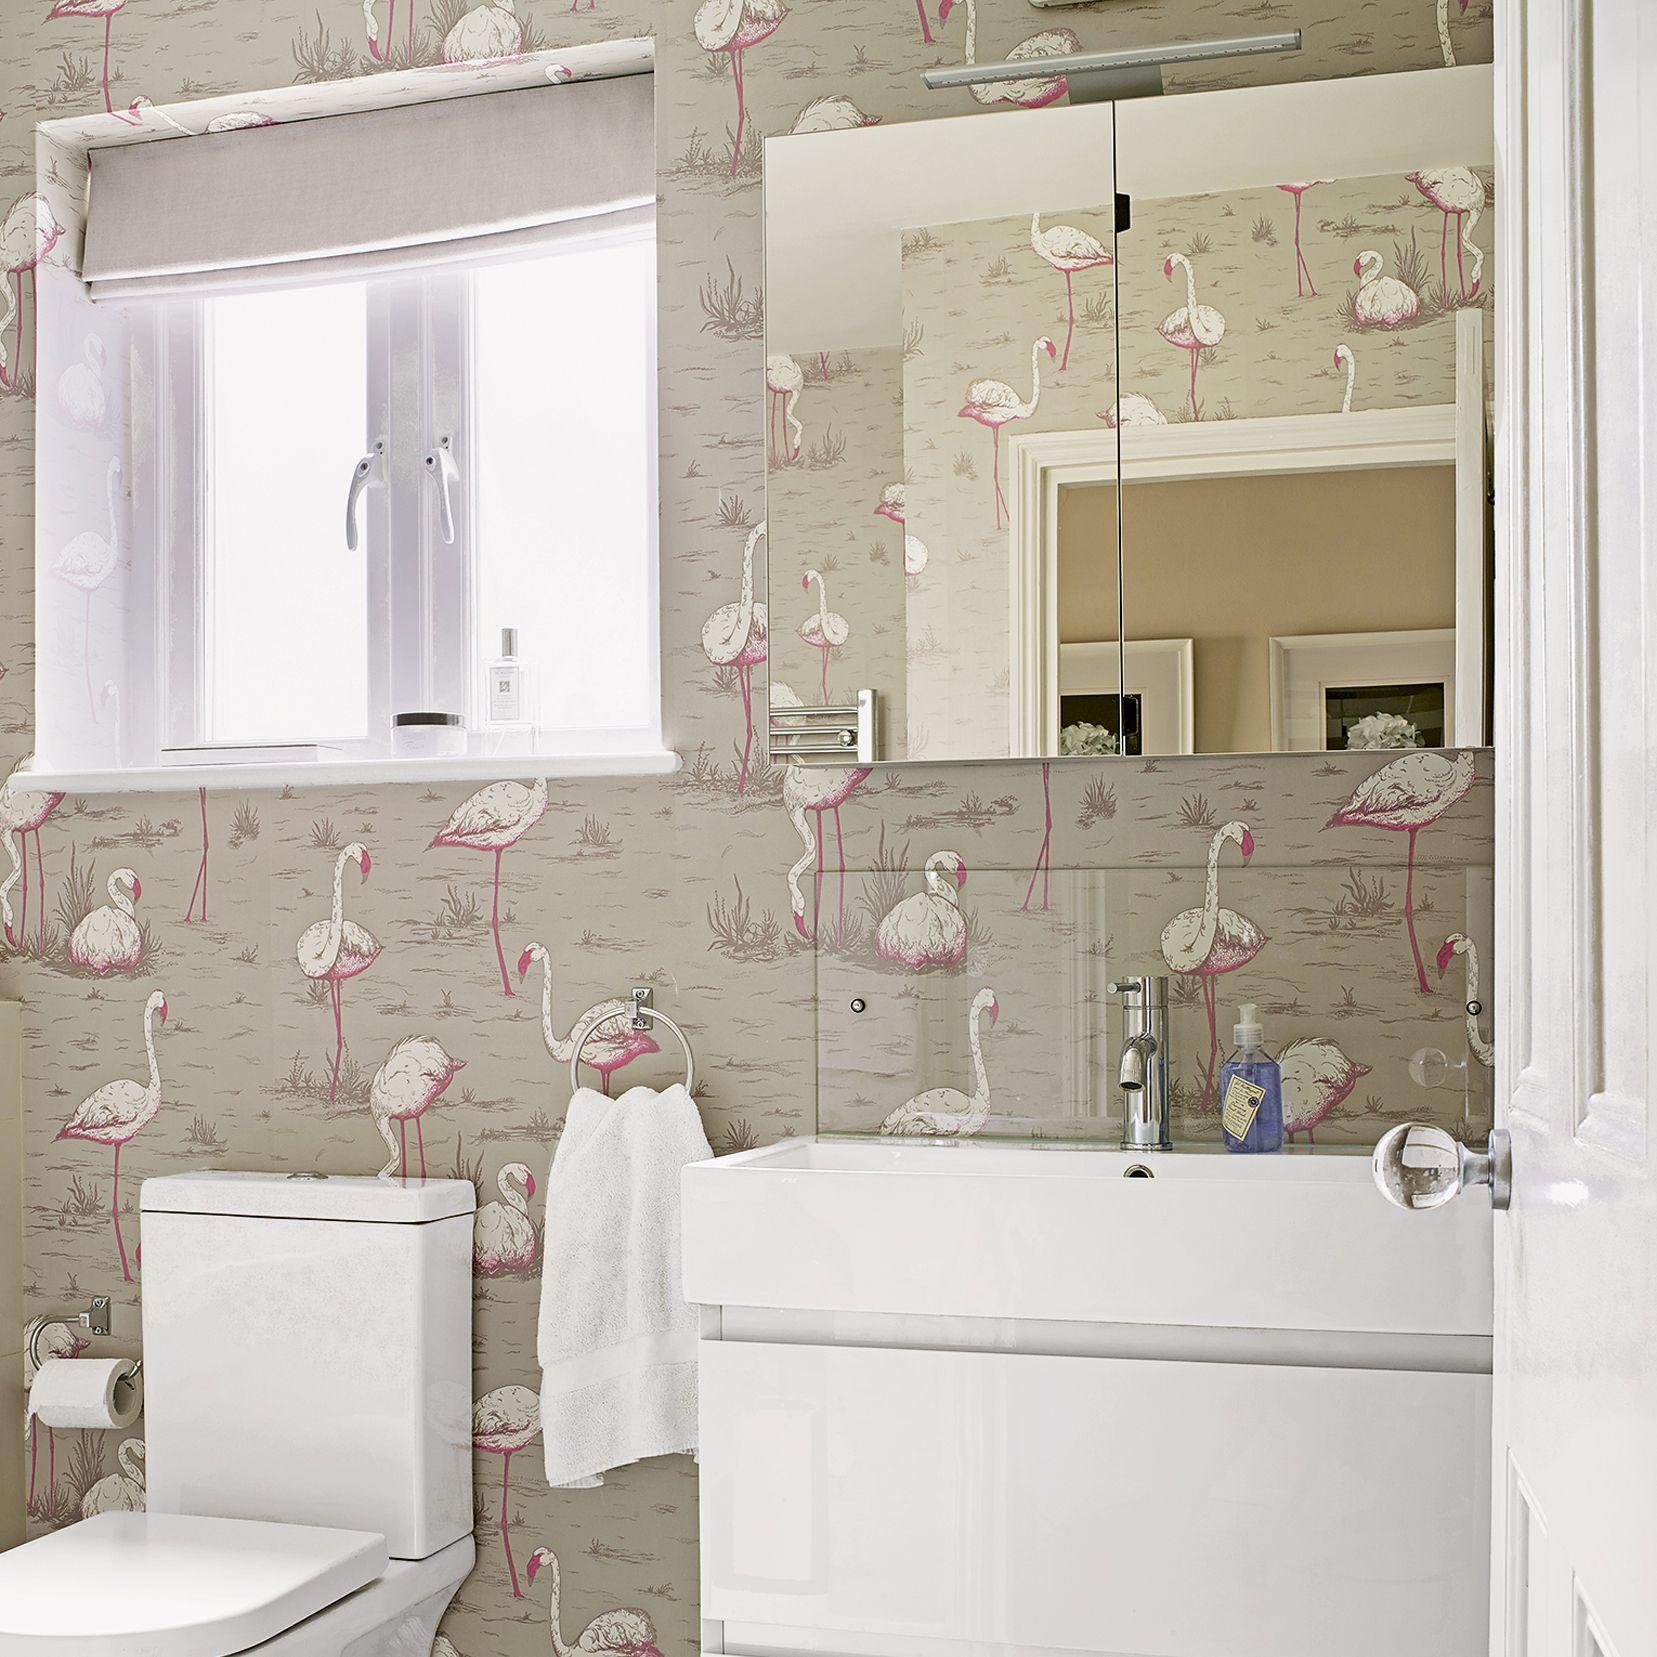 Small bathroom ideas - small bathroom decorating ideas on ...